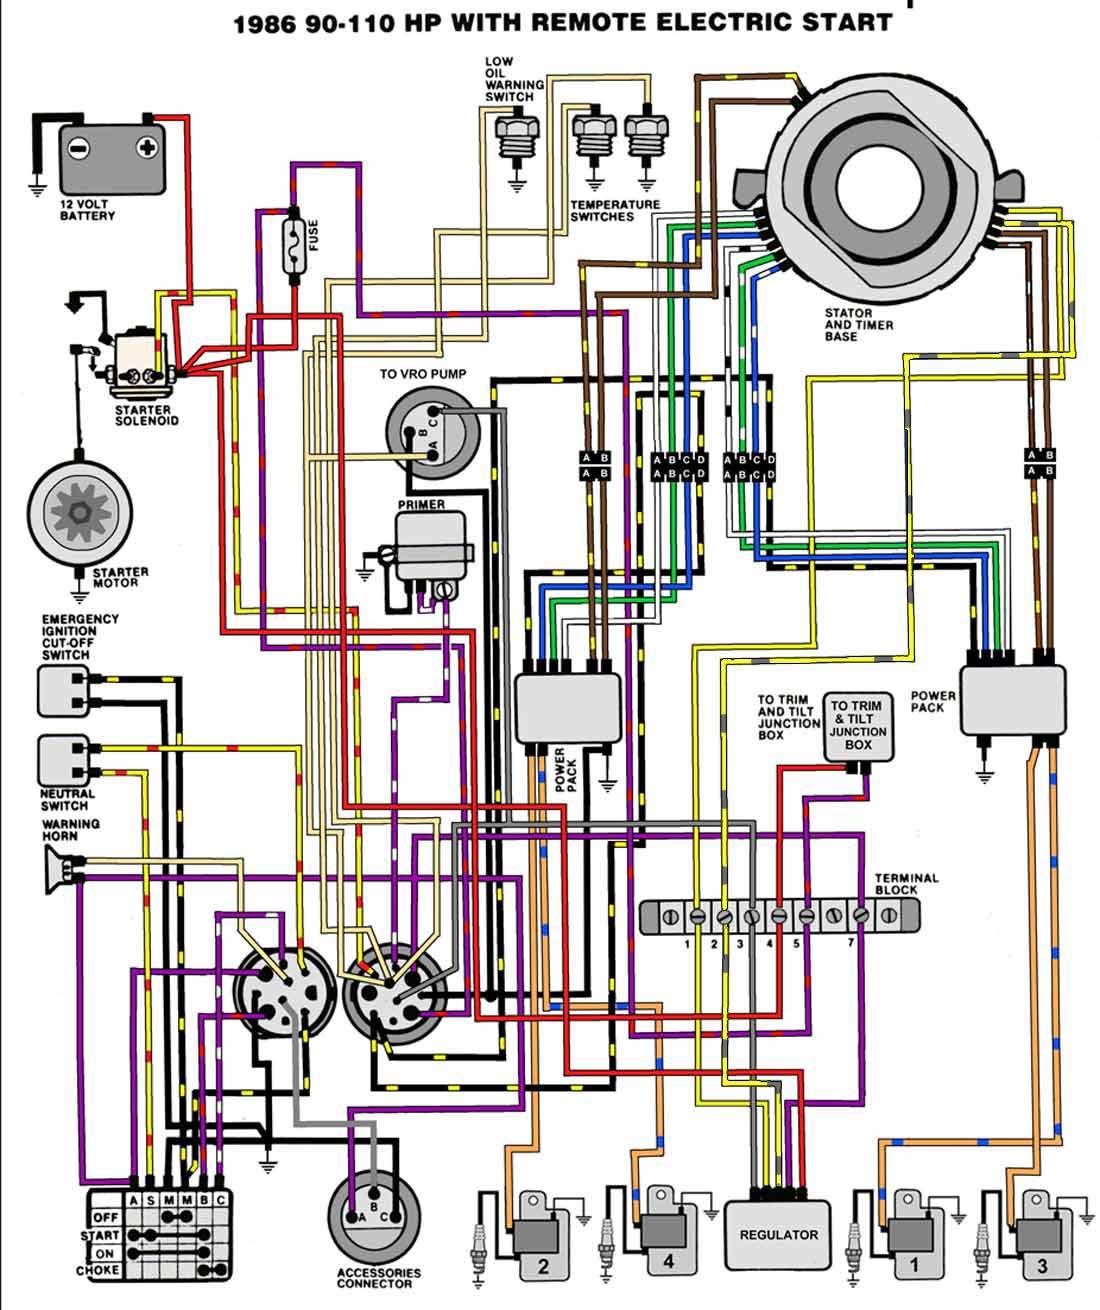 yamaha 90 outboard wiring diagram readingrat net Yamaha Outboards Wiring Diagrams yamaha outboard rectifier wiring diagram wiring diagram,wiring diagram, yamaha 90 outboard wiring yamaha outboards wiring diagrams